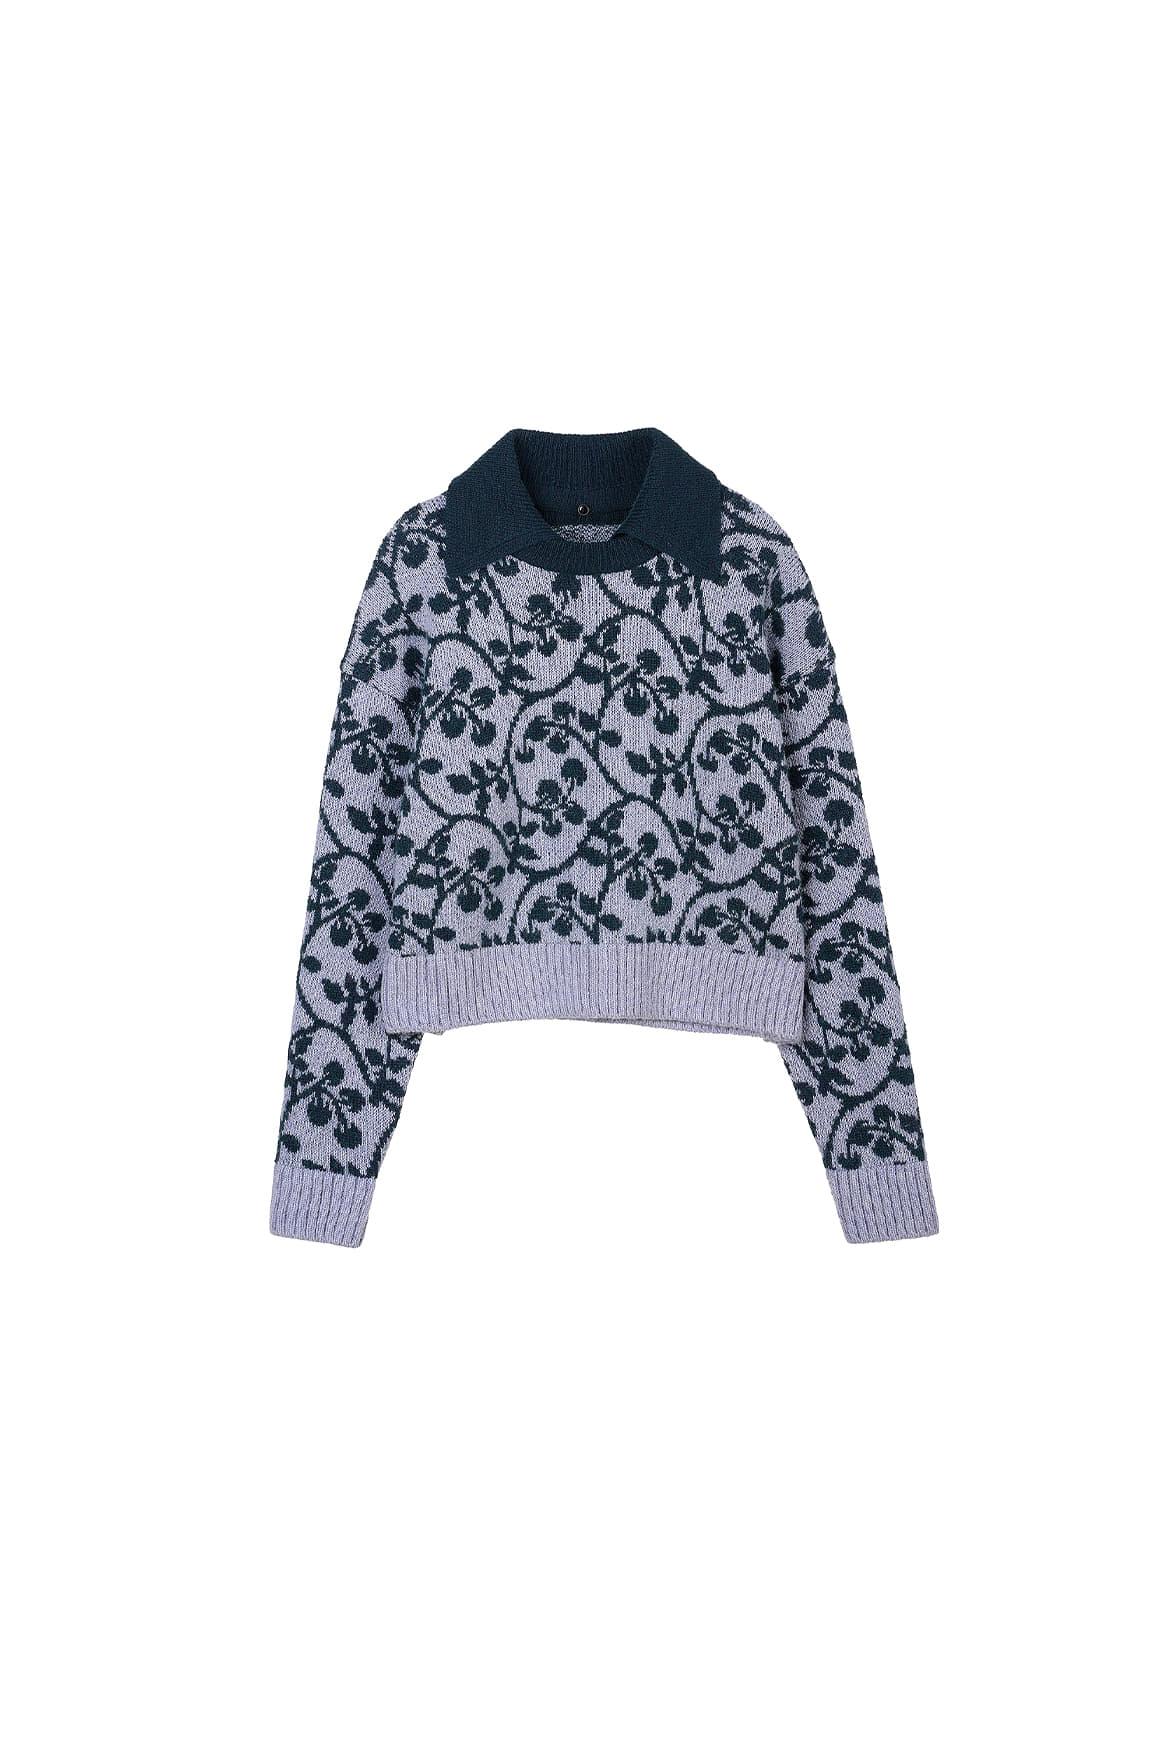 Lierre Detachable Collar Sweater_Purple Heather